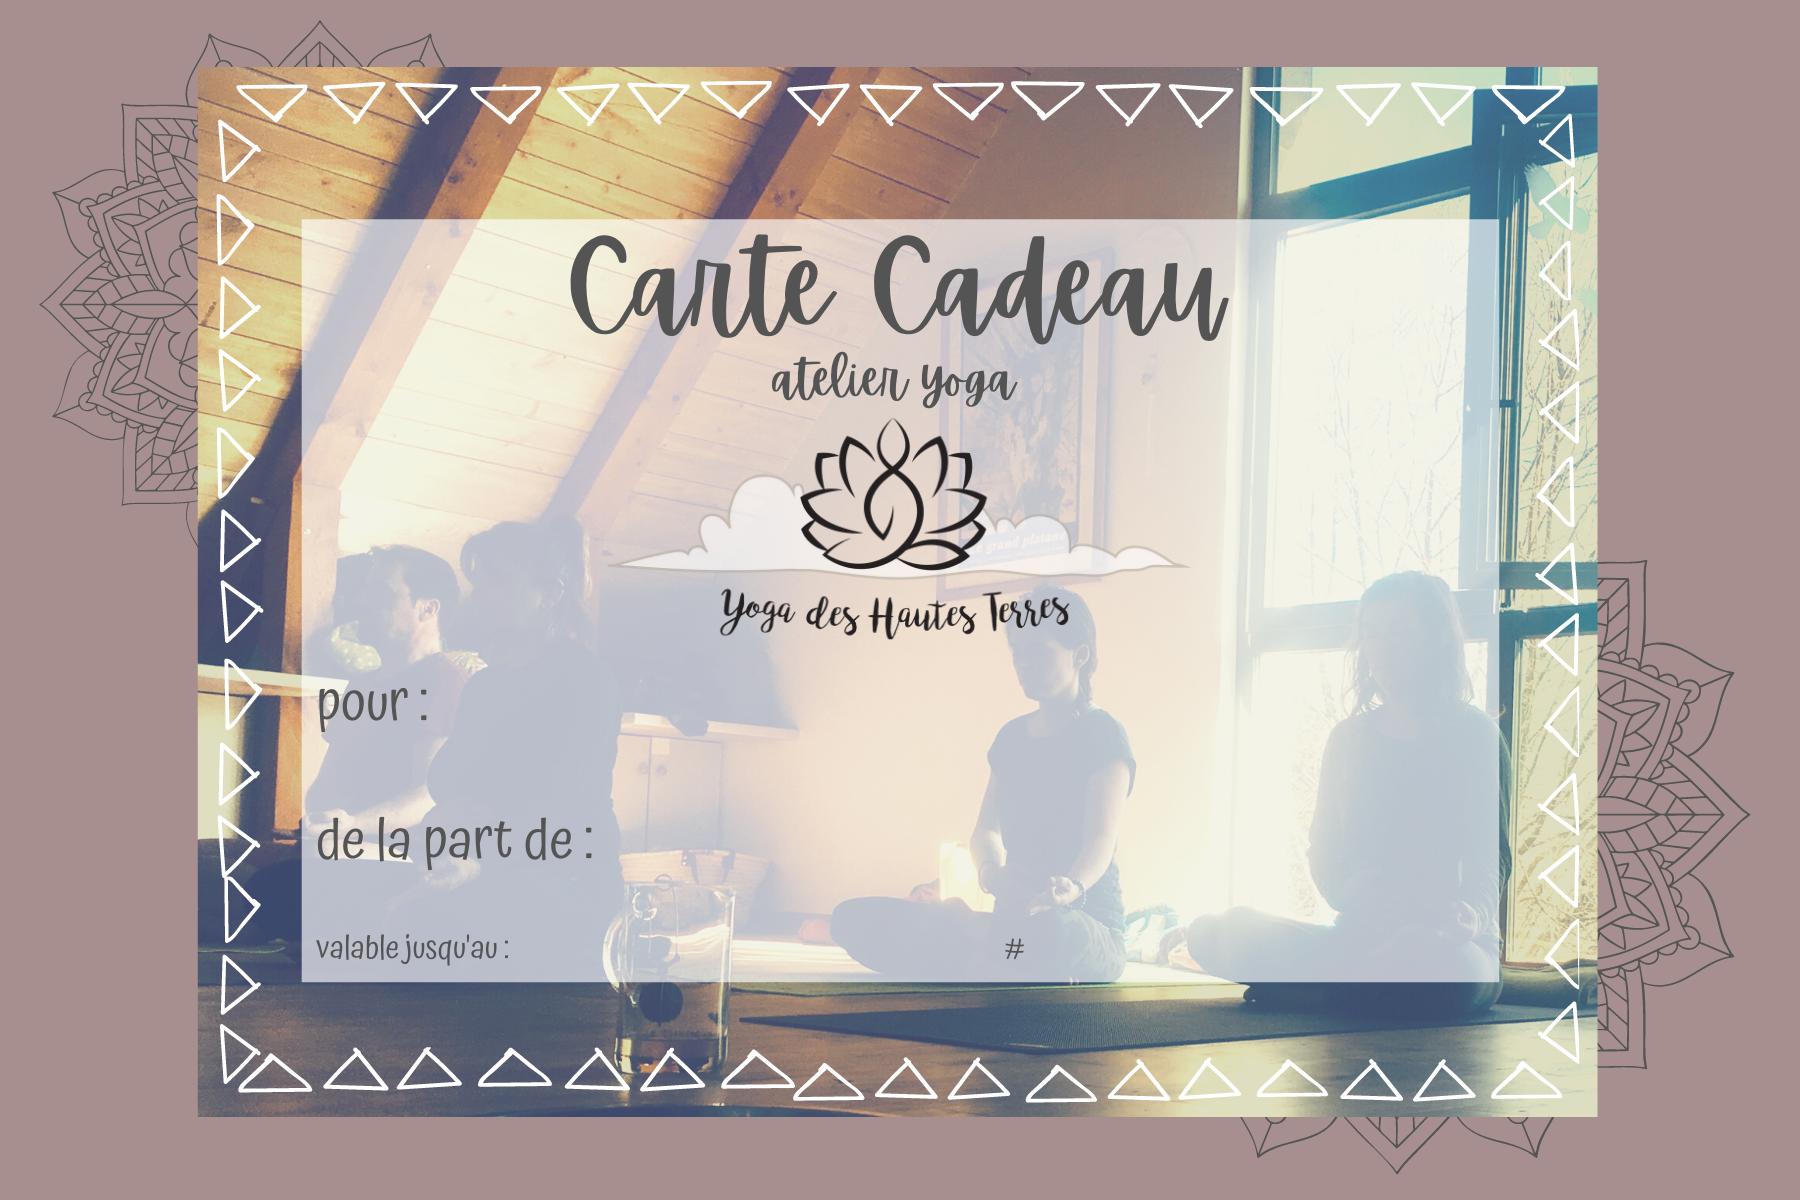 carte cadeau yoga cantal -atelier